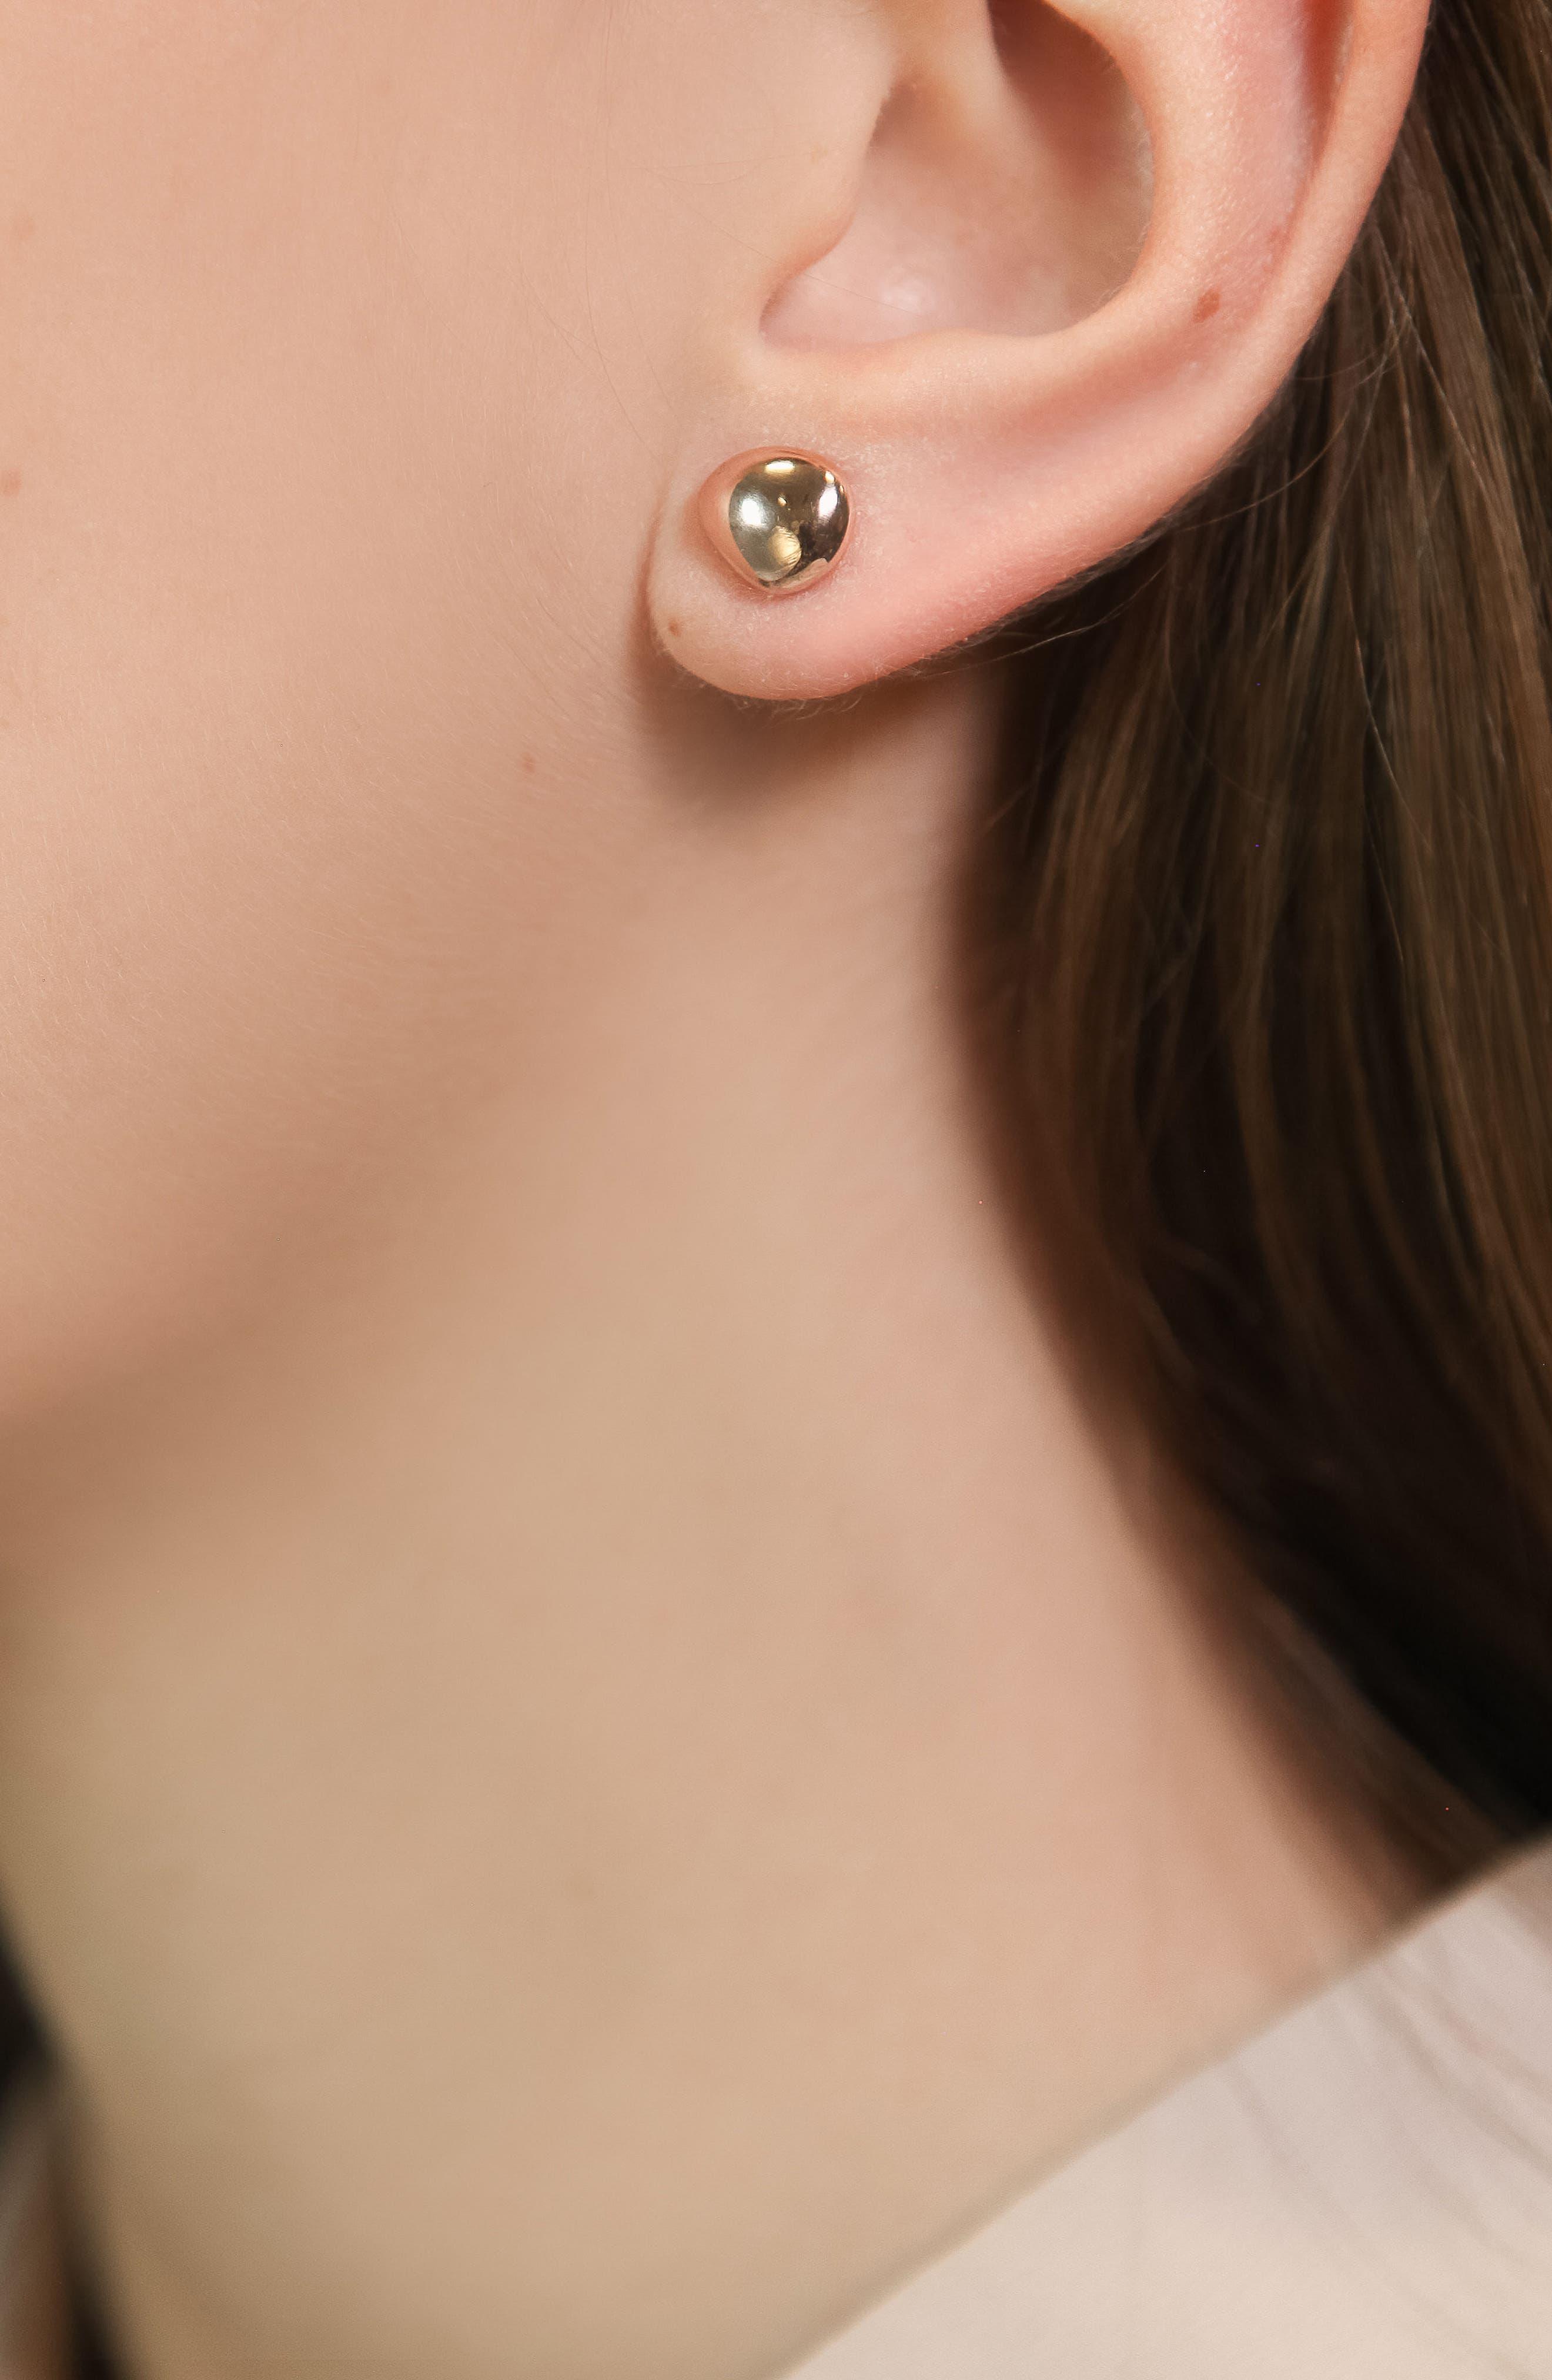 Nura Small Pebble Stud Earrings,                             Alternate thumbnail 2, color,                             ROSE GOLD